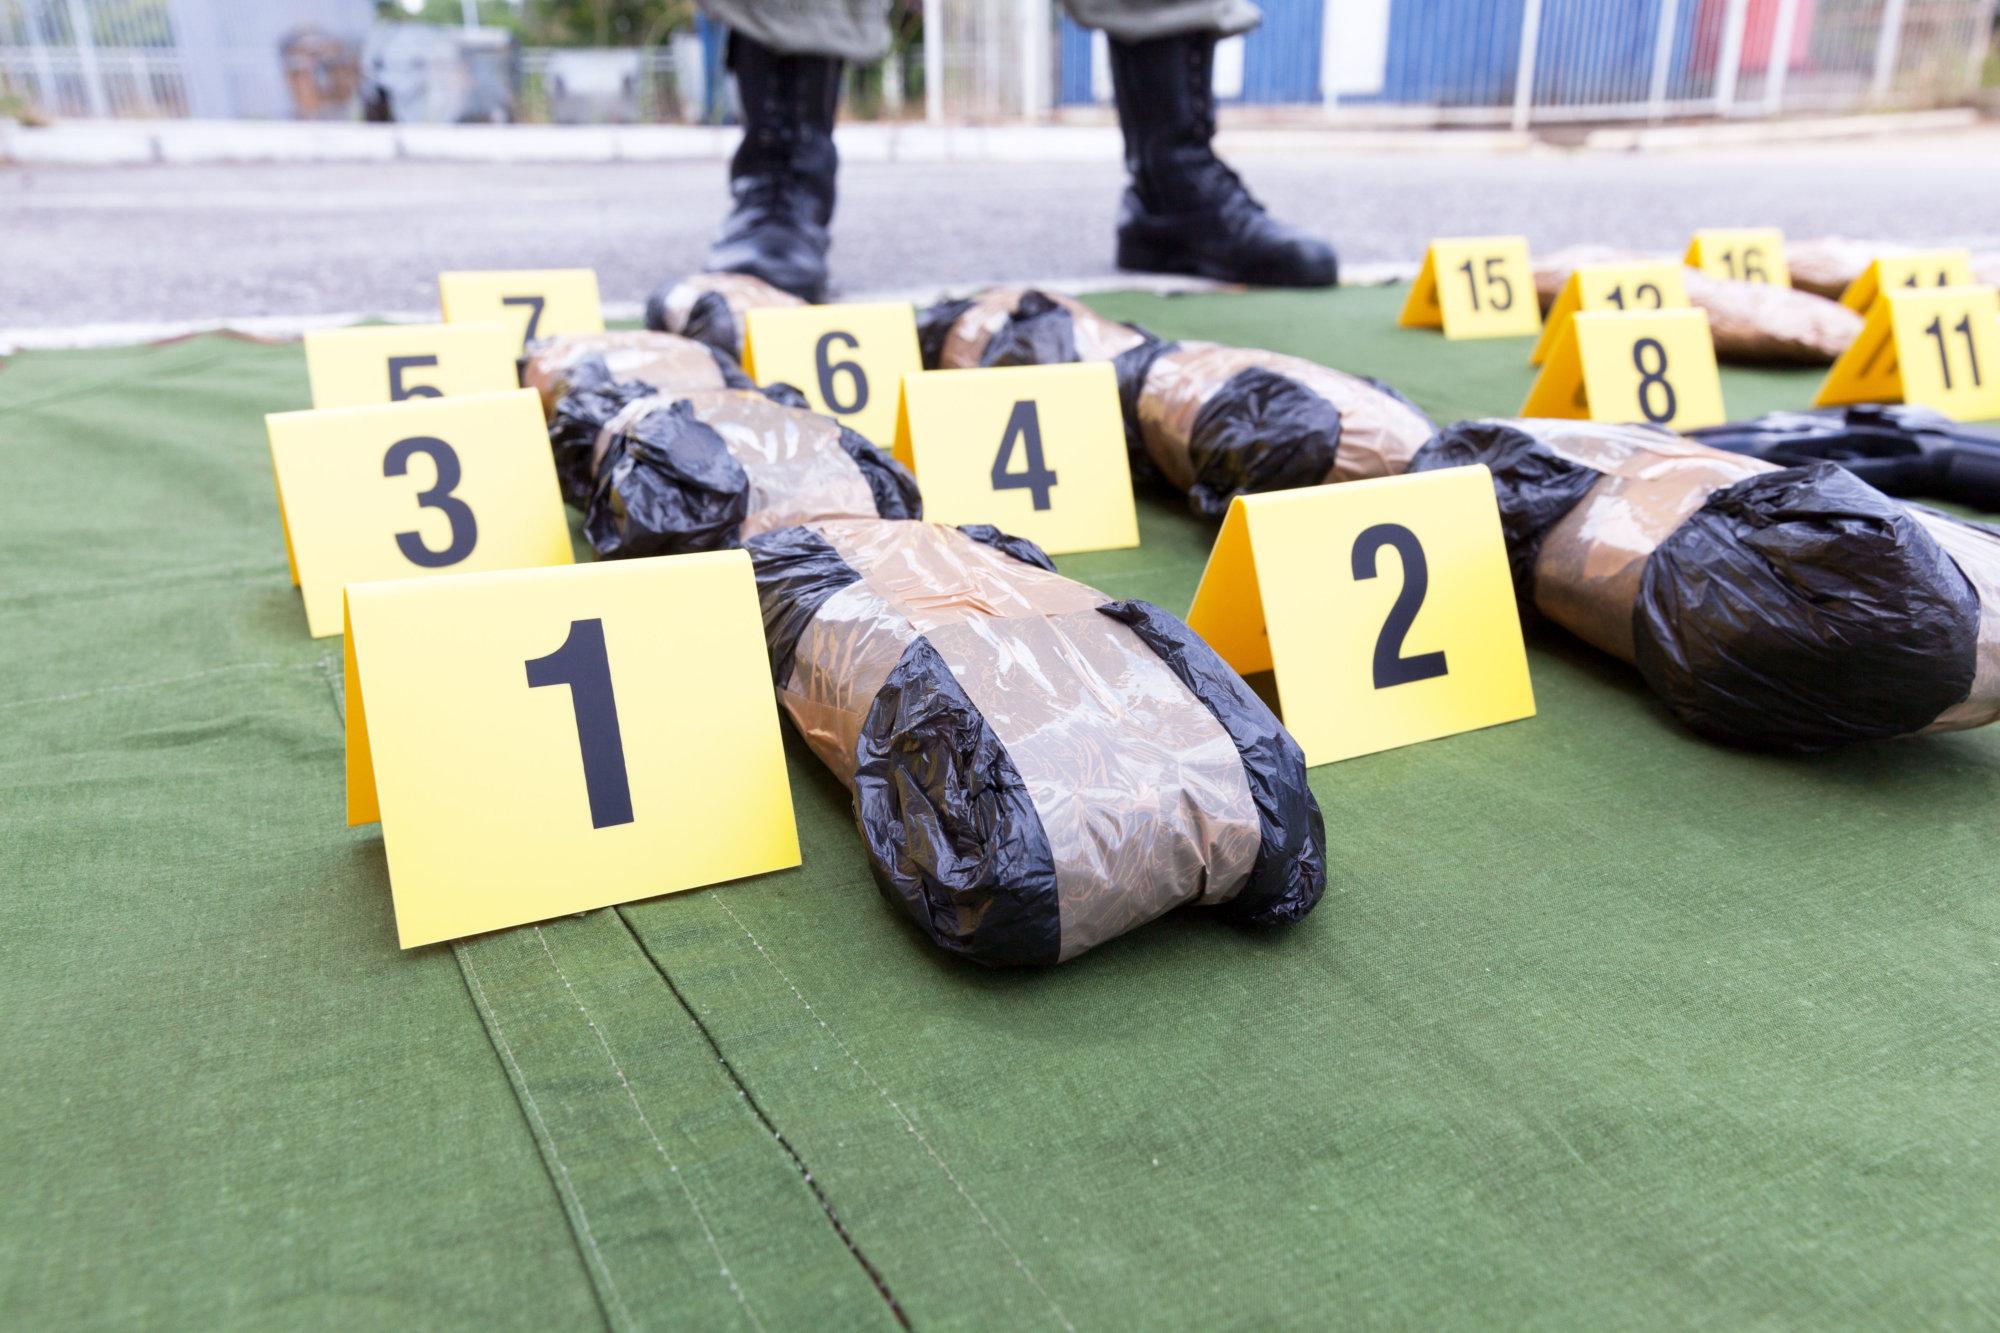 Leader of international cocaine trafficking network sentenced in Va.